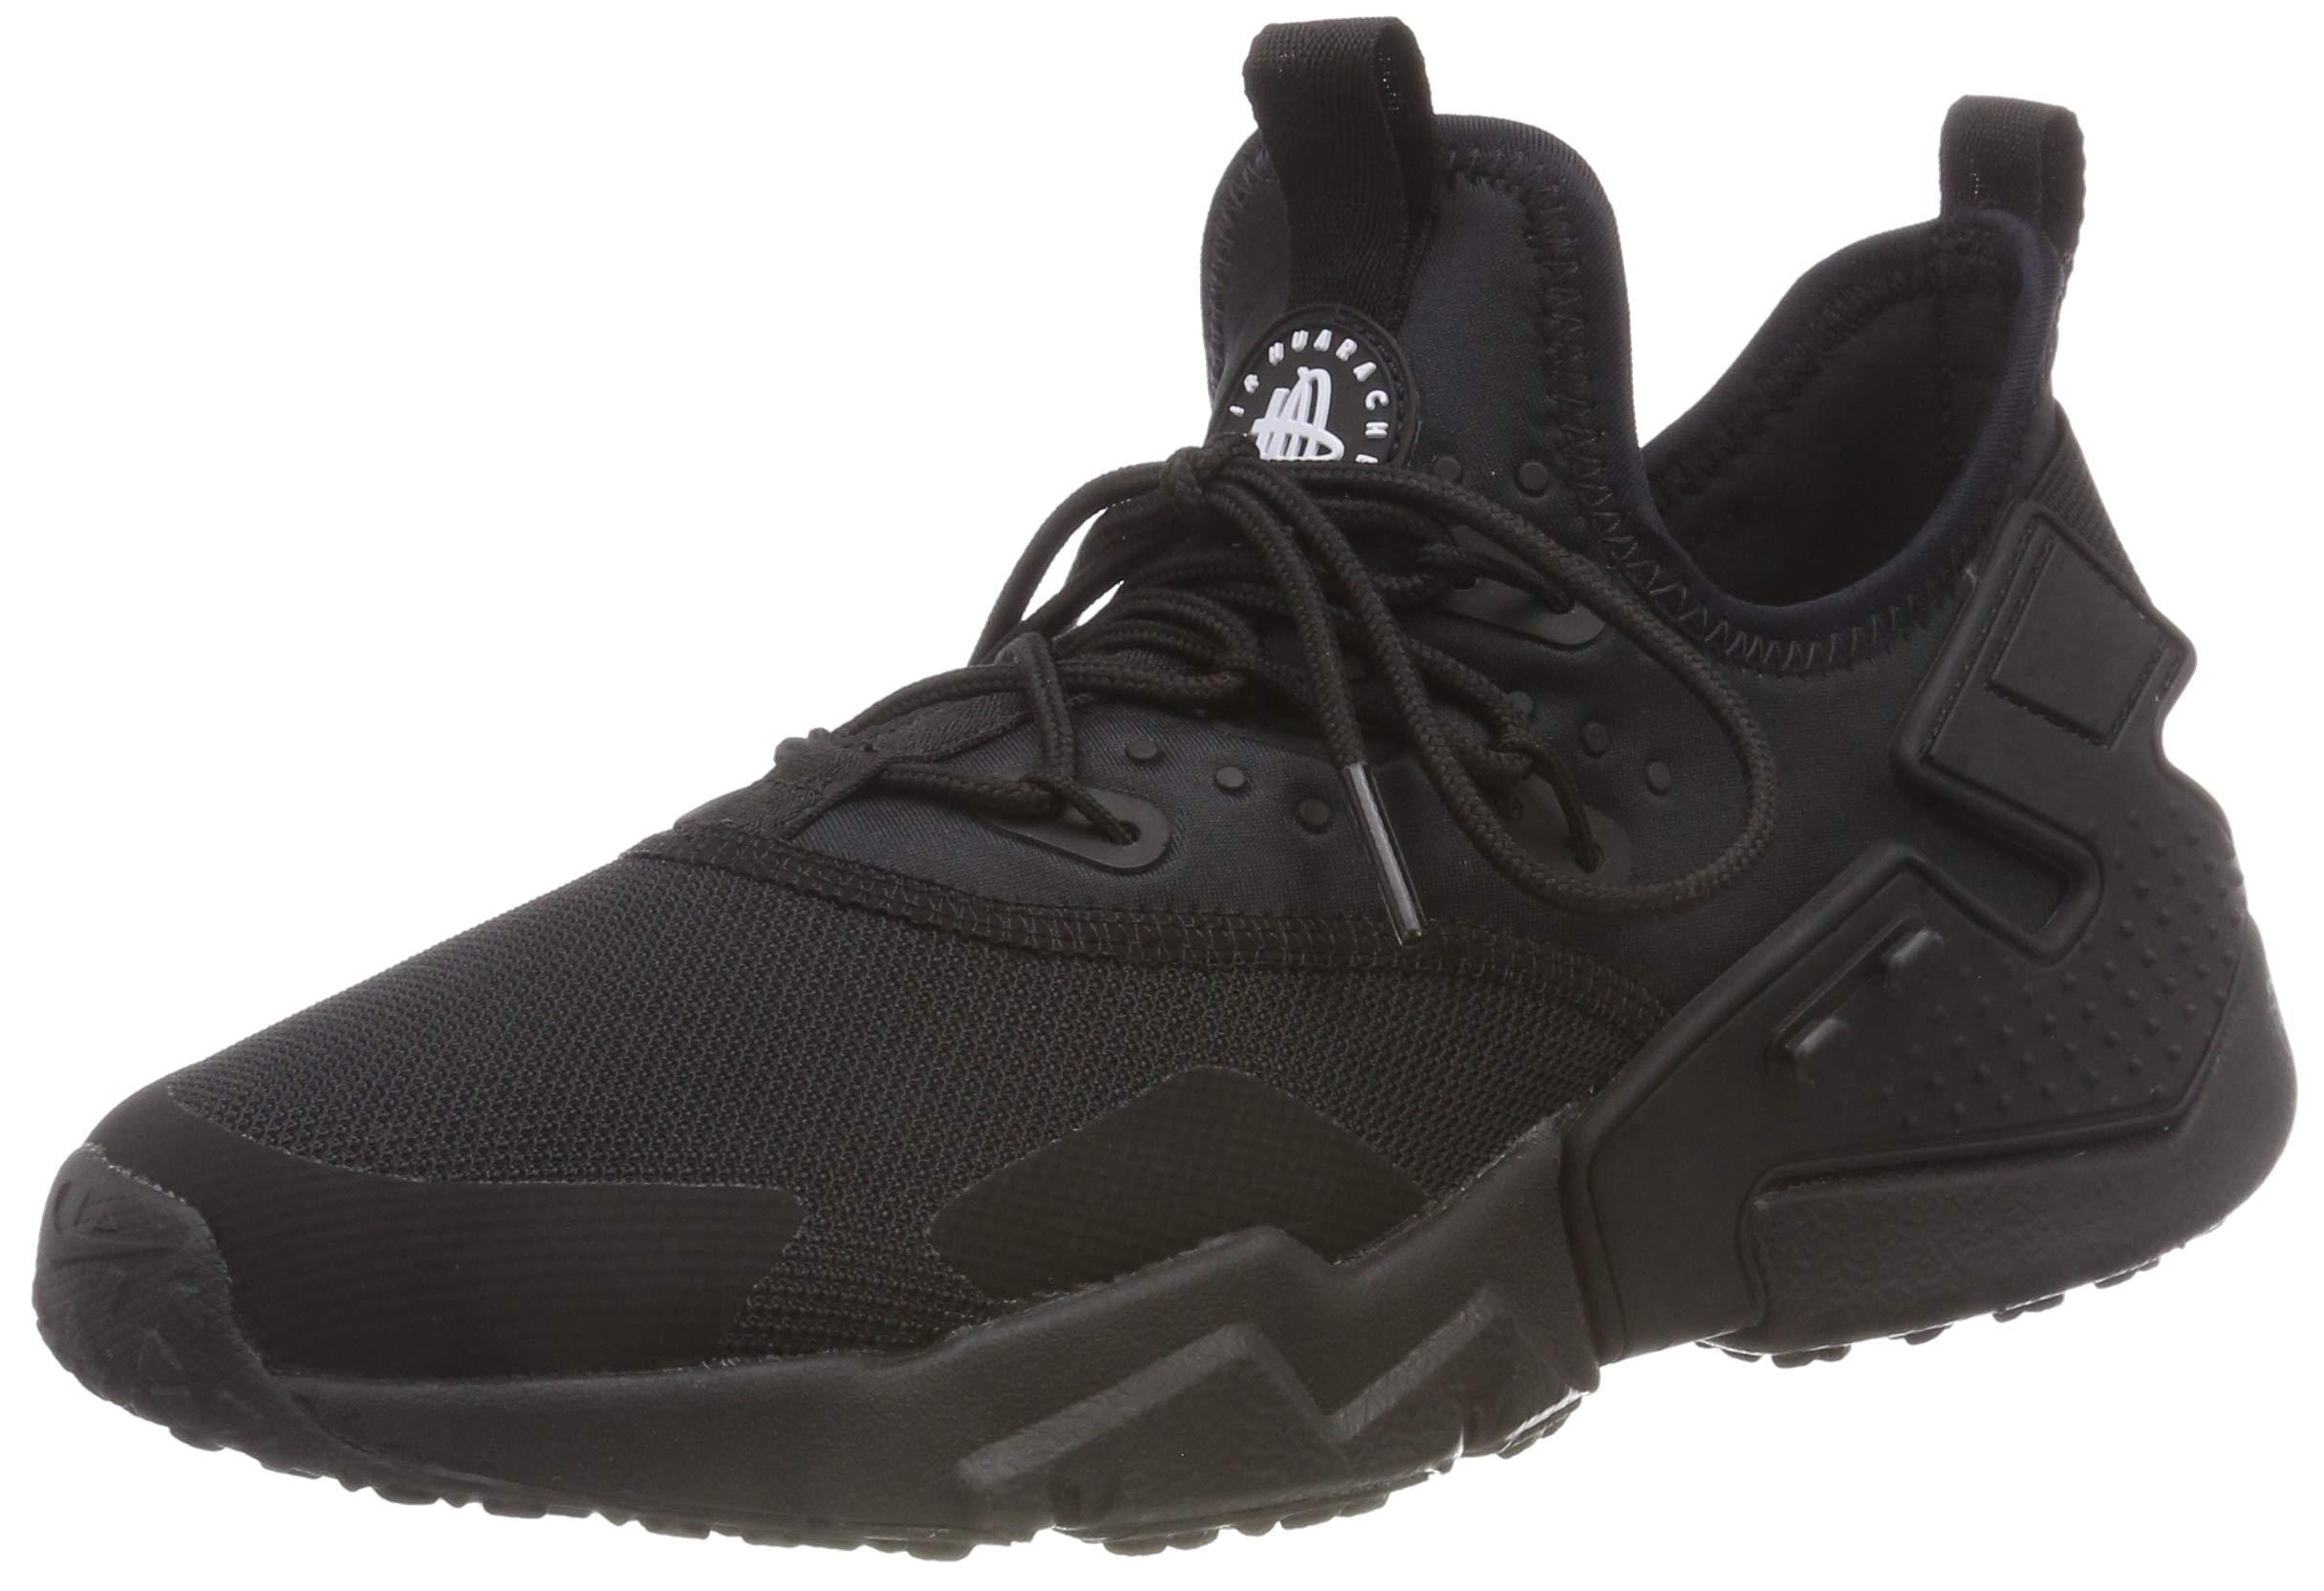 0698664e943e7 Nike Air Huarache Drift Men's Athletic Shoes Black/White ah7334-003 (13  D(M) US)